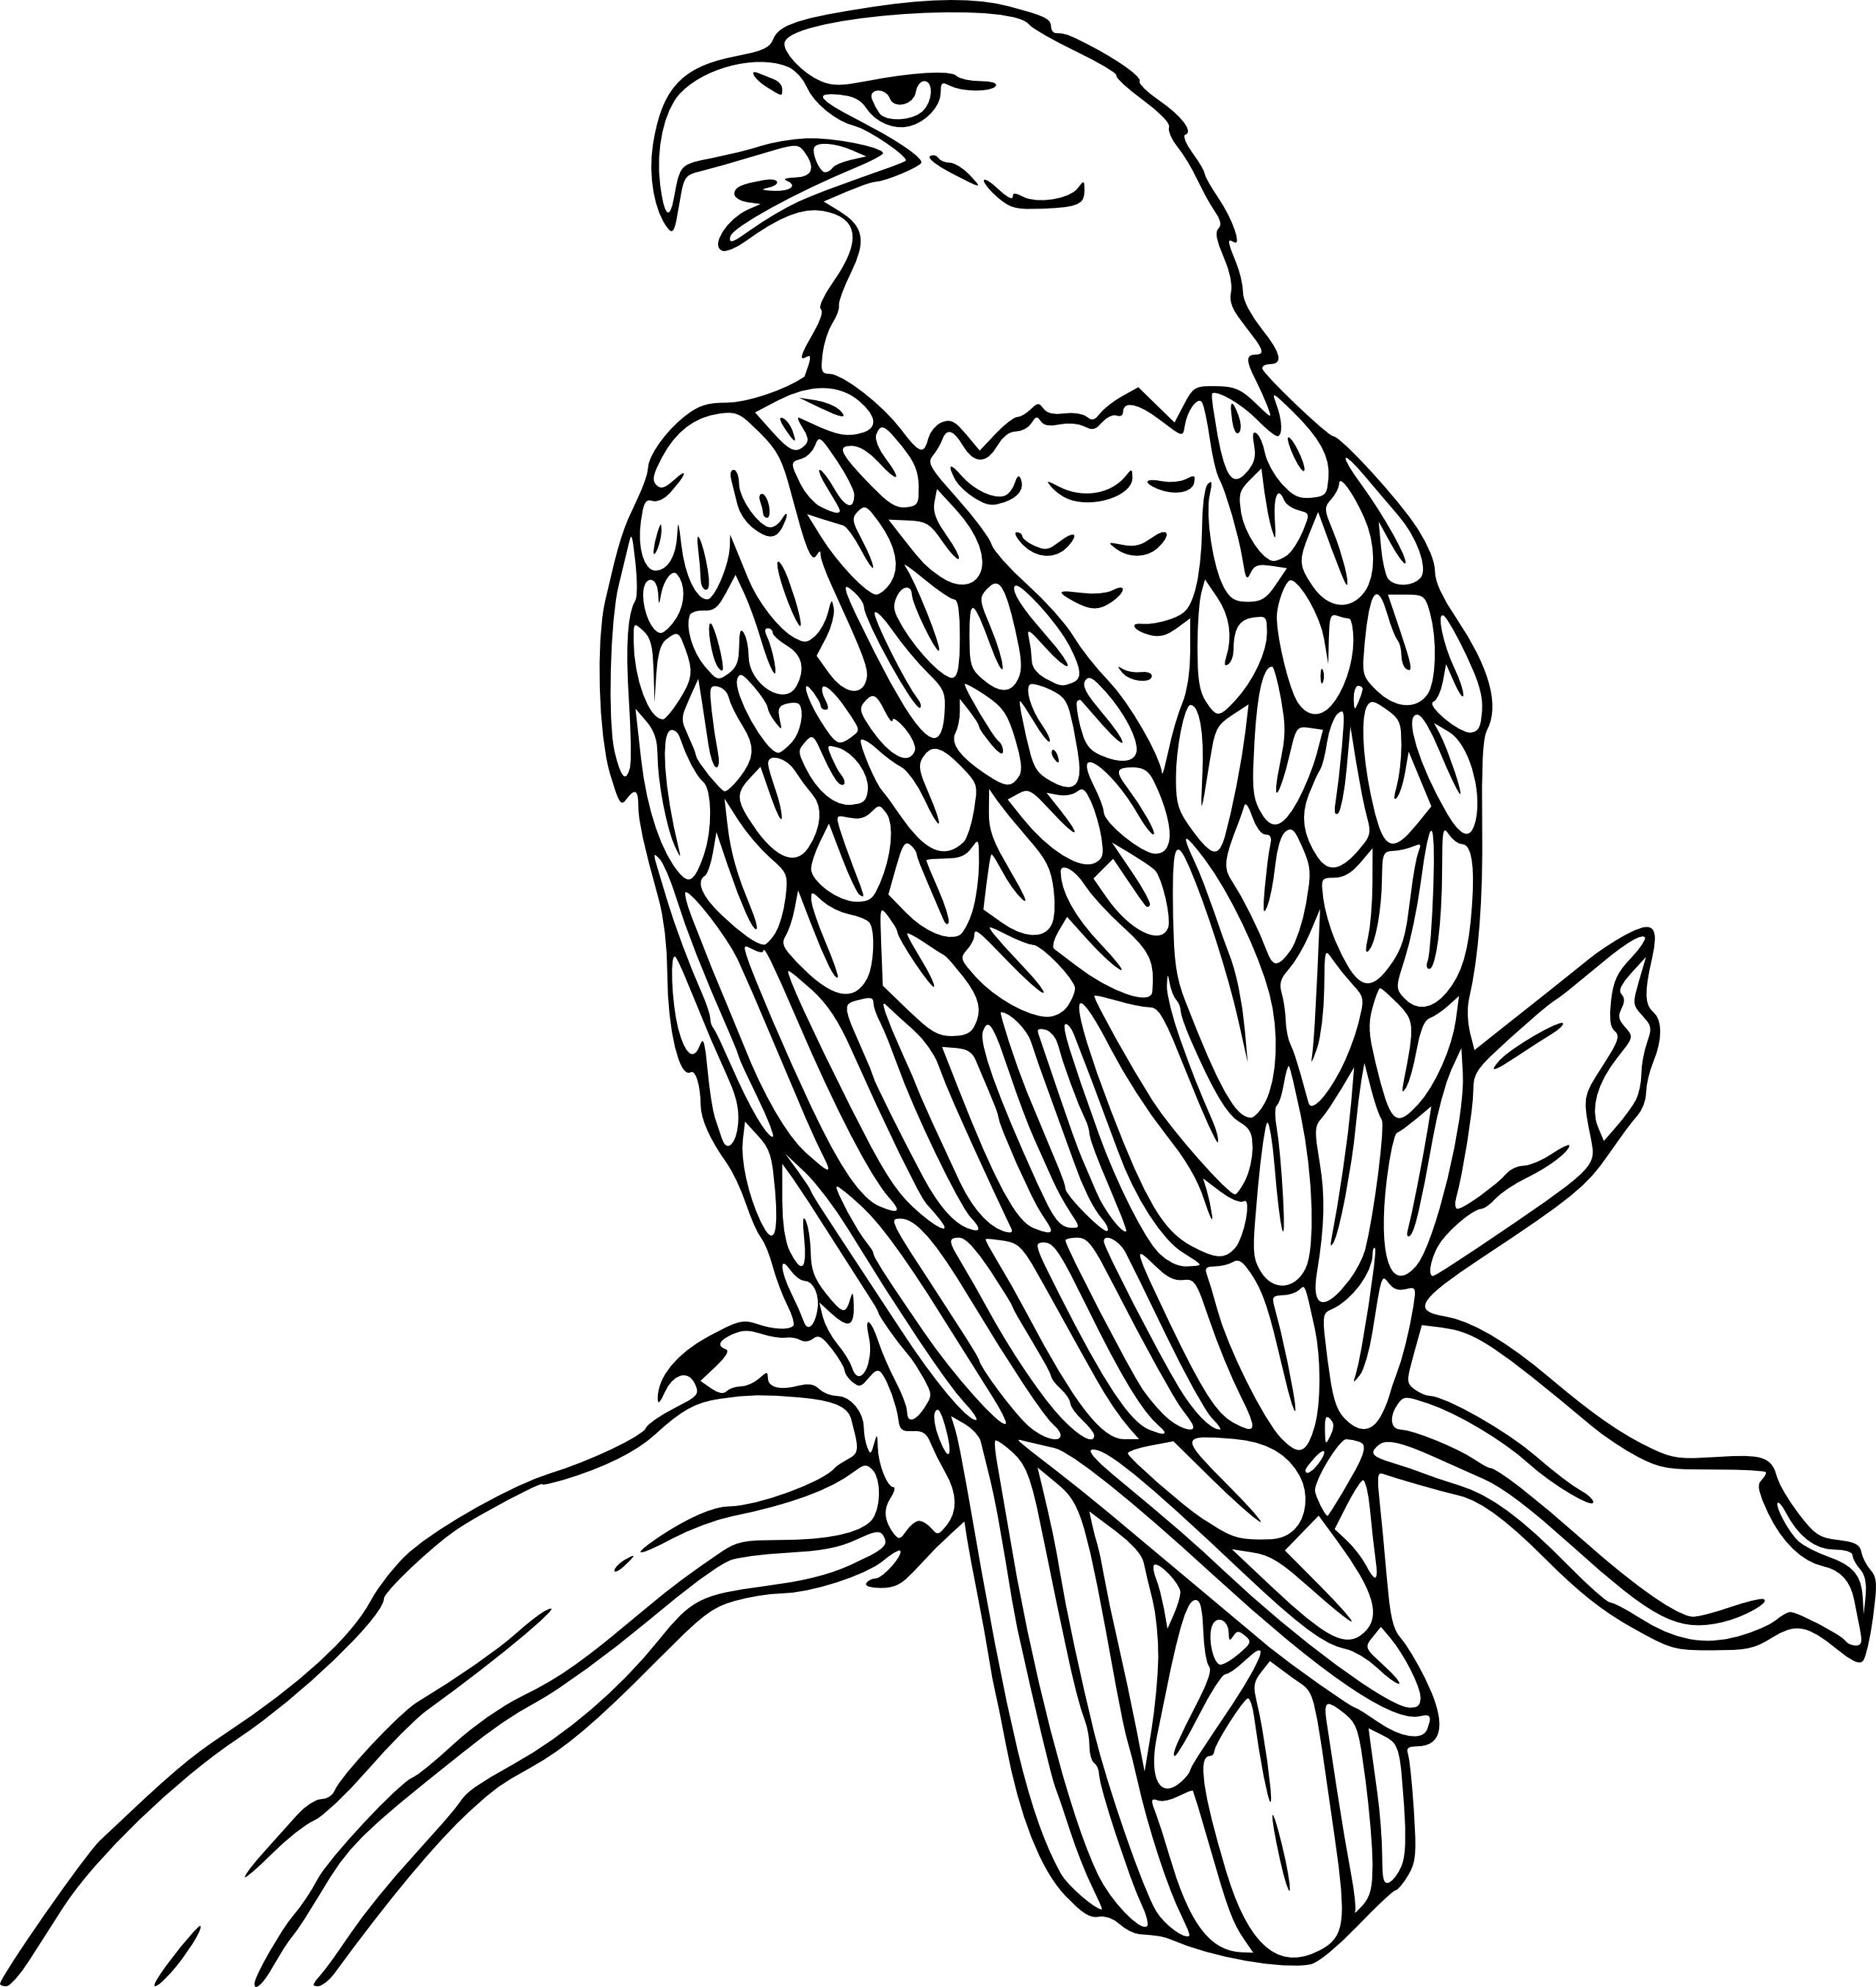 Uncategorized Eagle Coloring united states bald eagle coloring page murderthestout printable pages me